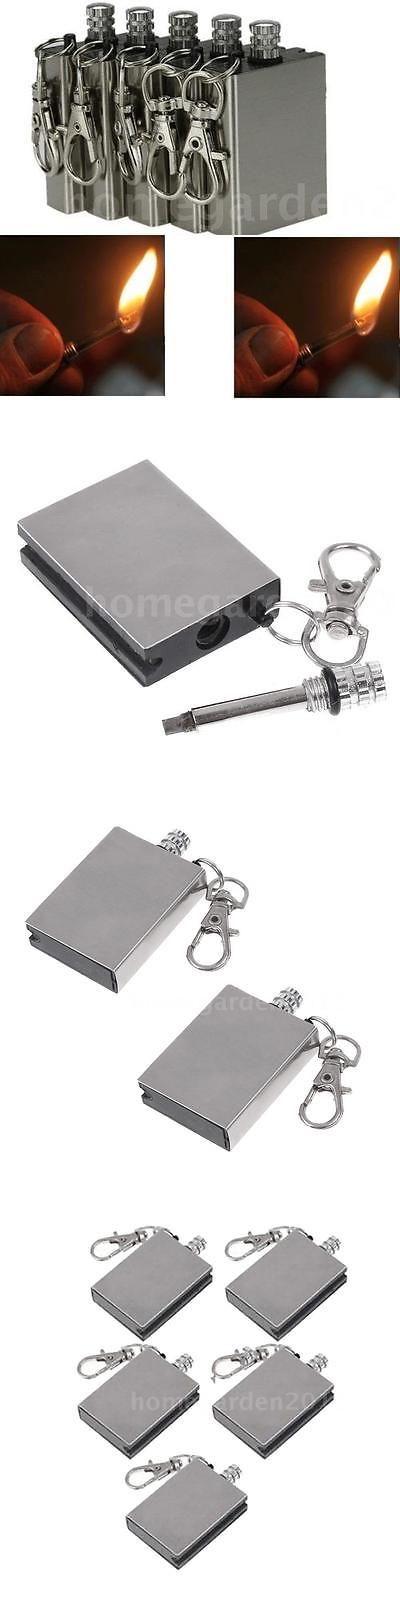 Fire Starters 166126: 100 Pcs Survival Fire Starter Flint Match Metal Lighter Outdoor Camping Kit I7z1 -> BUY IT NOW ONLY: $62.45 on eBay!